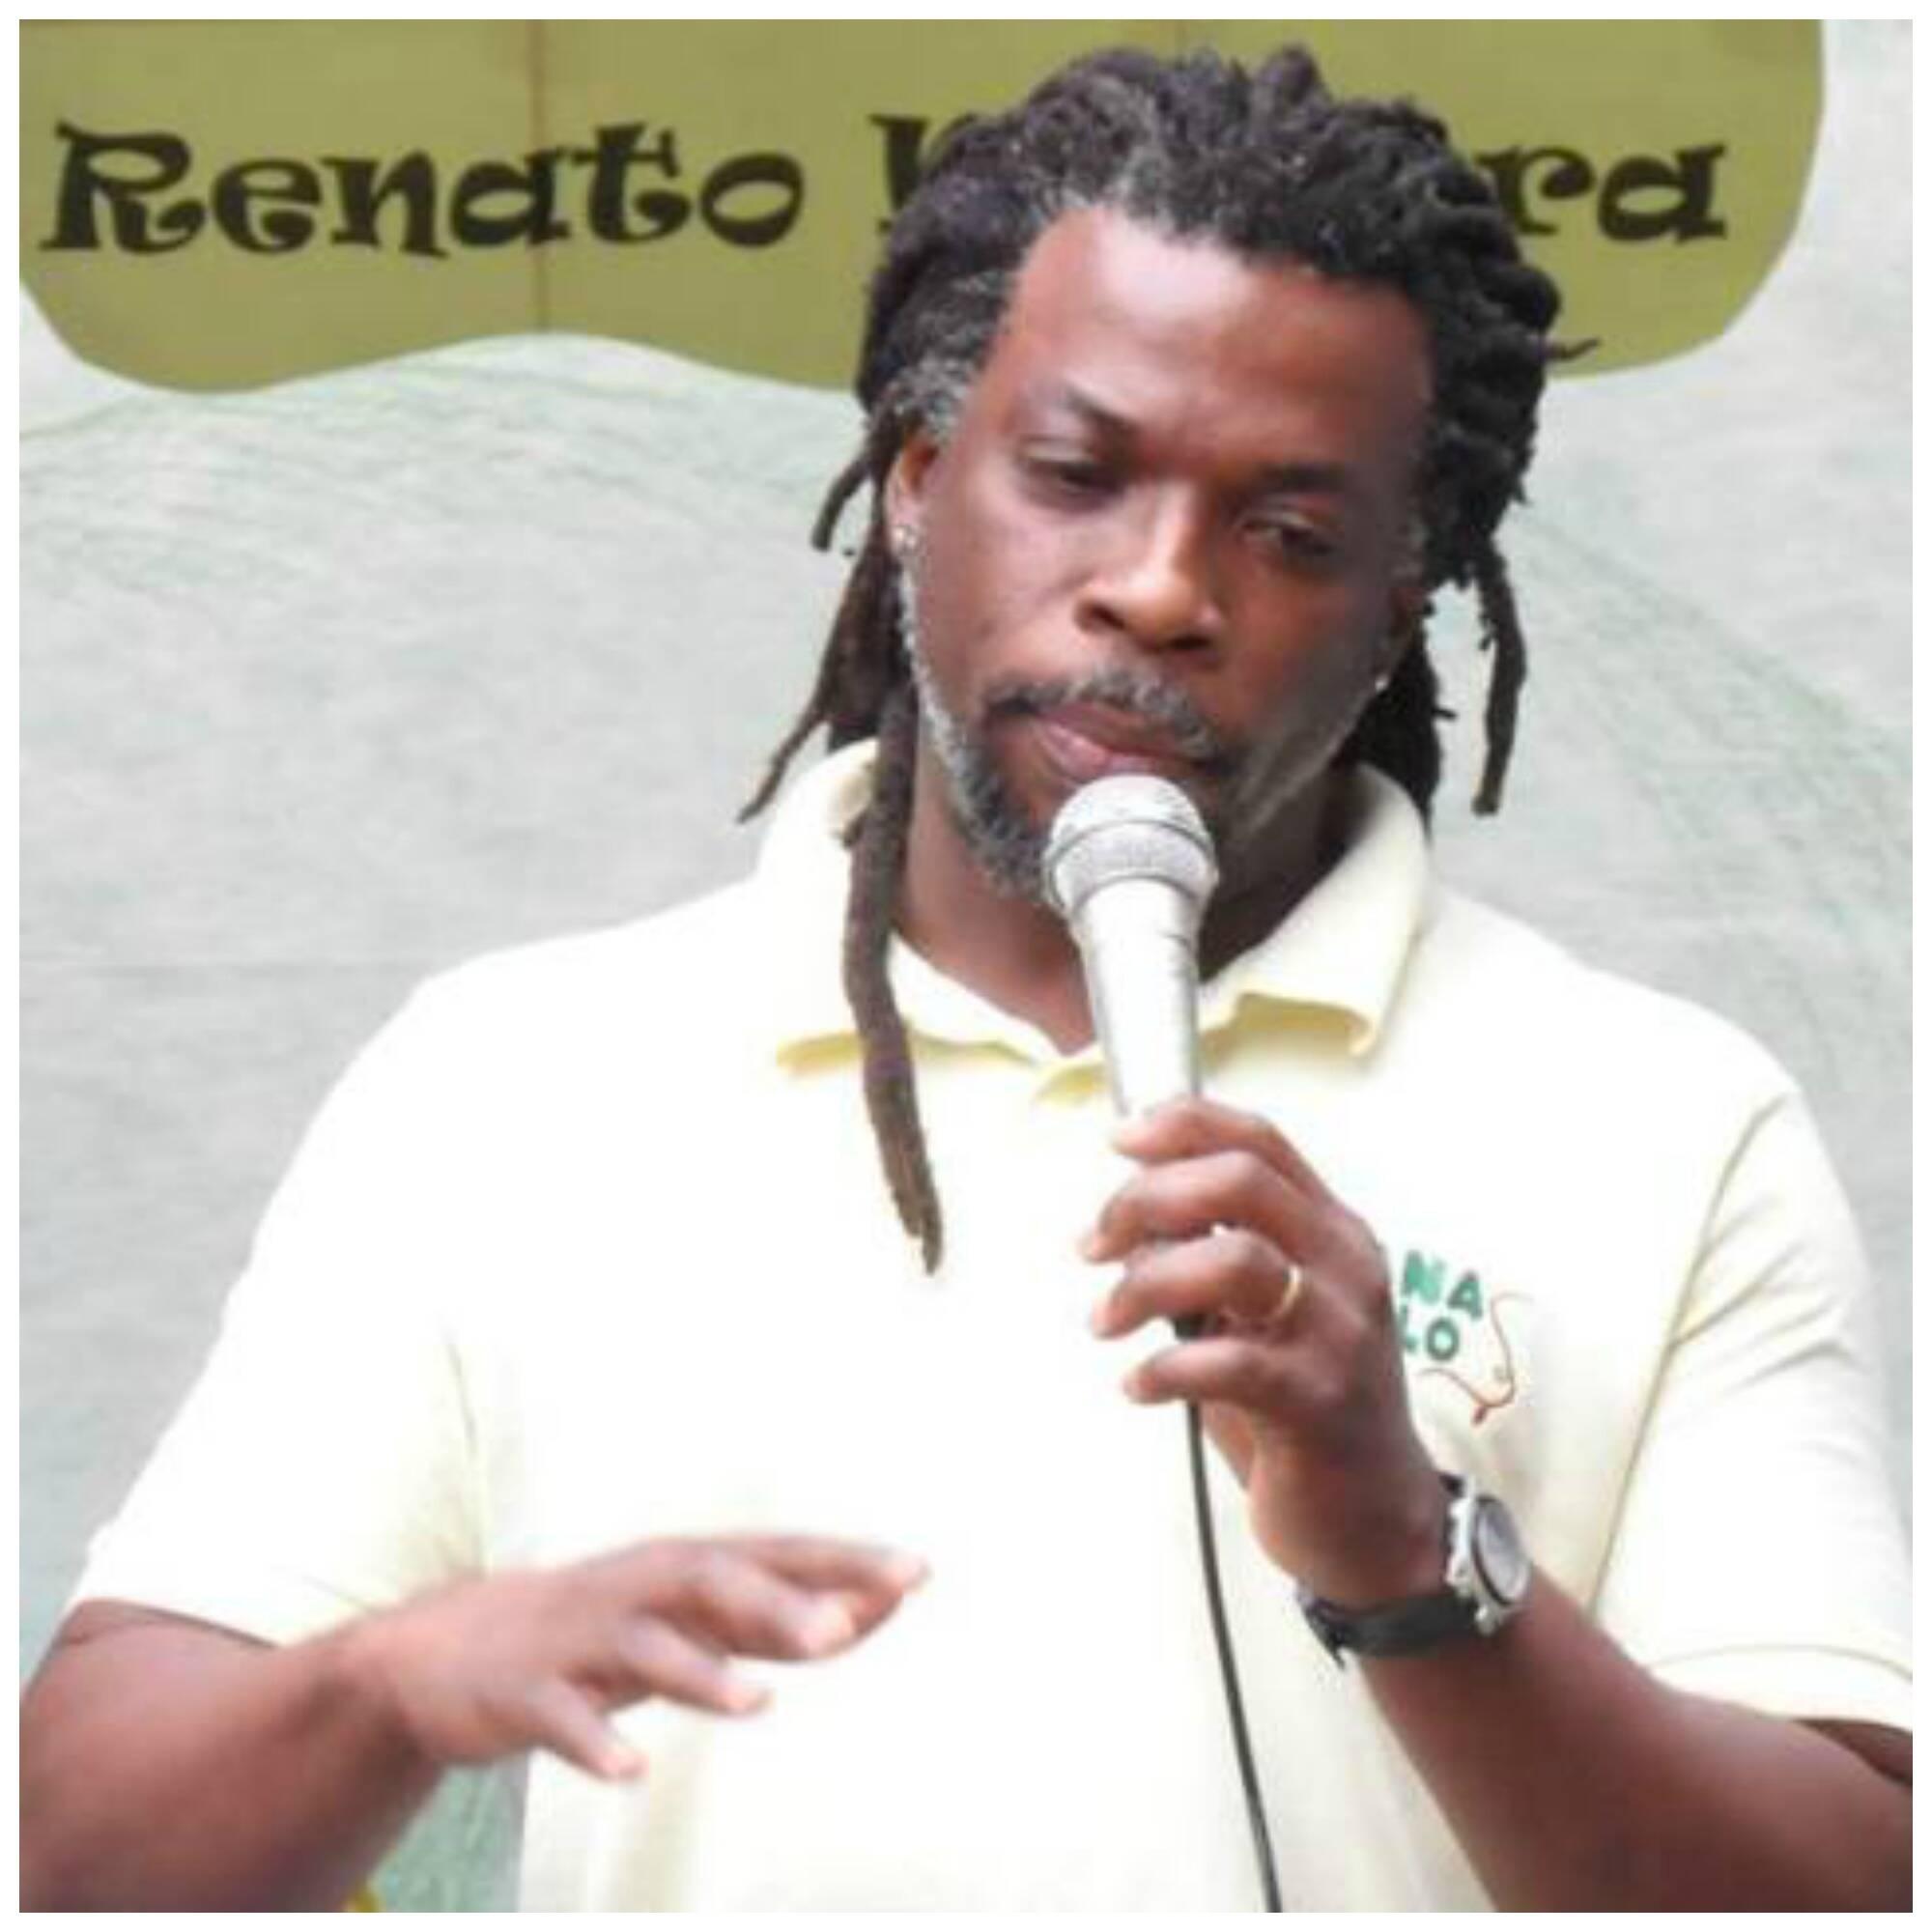 Professor Renato